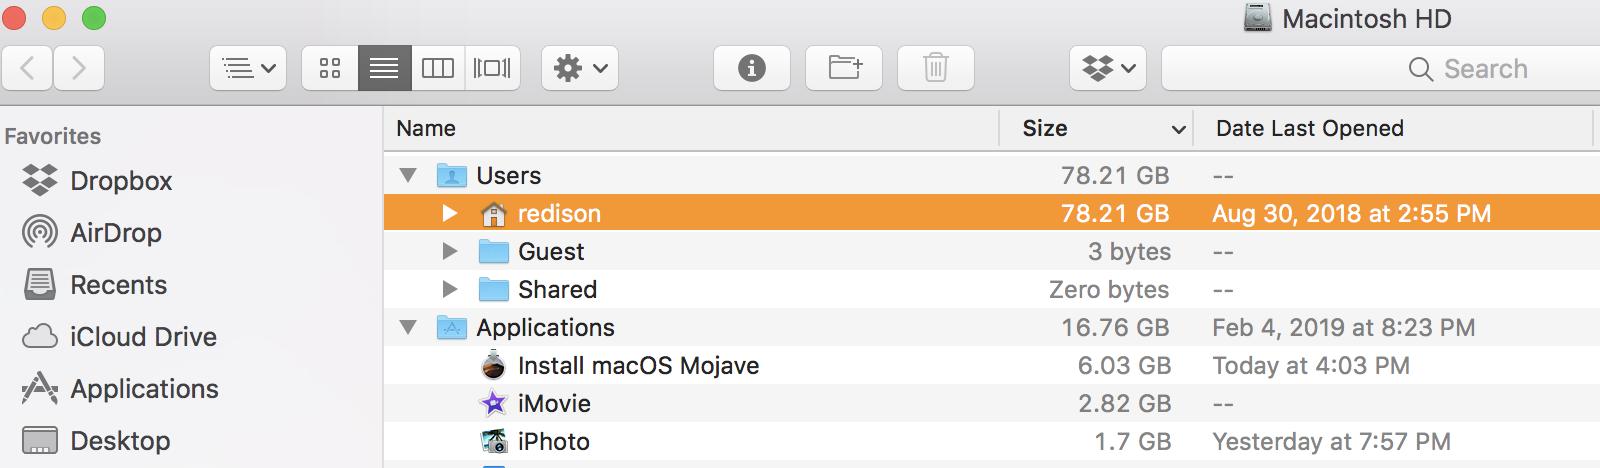 macOS Mojave won't install on my MacB… - Apple Community